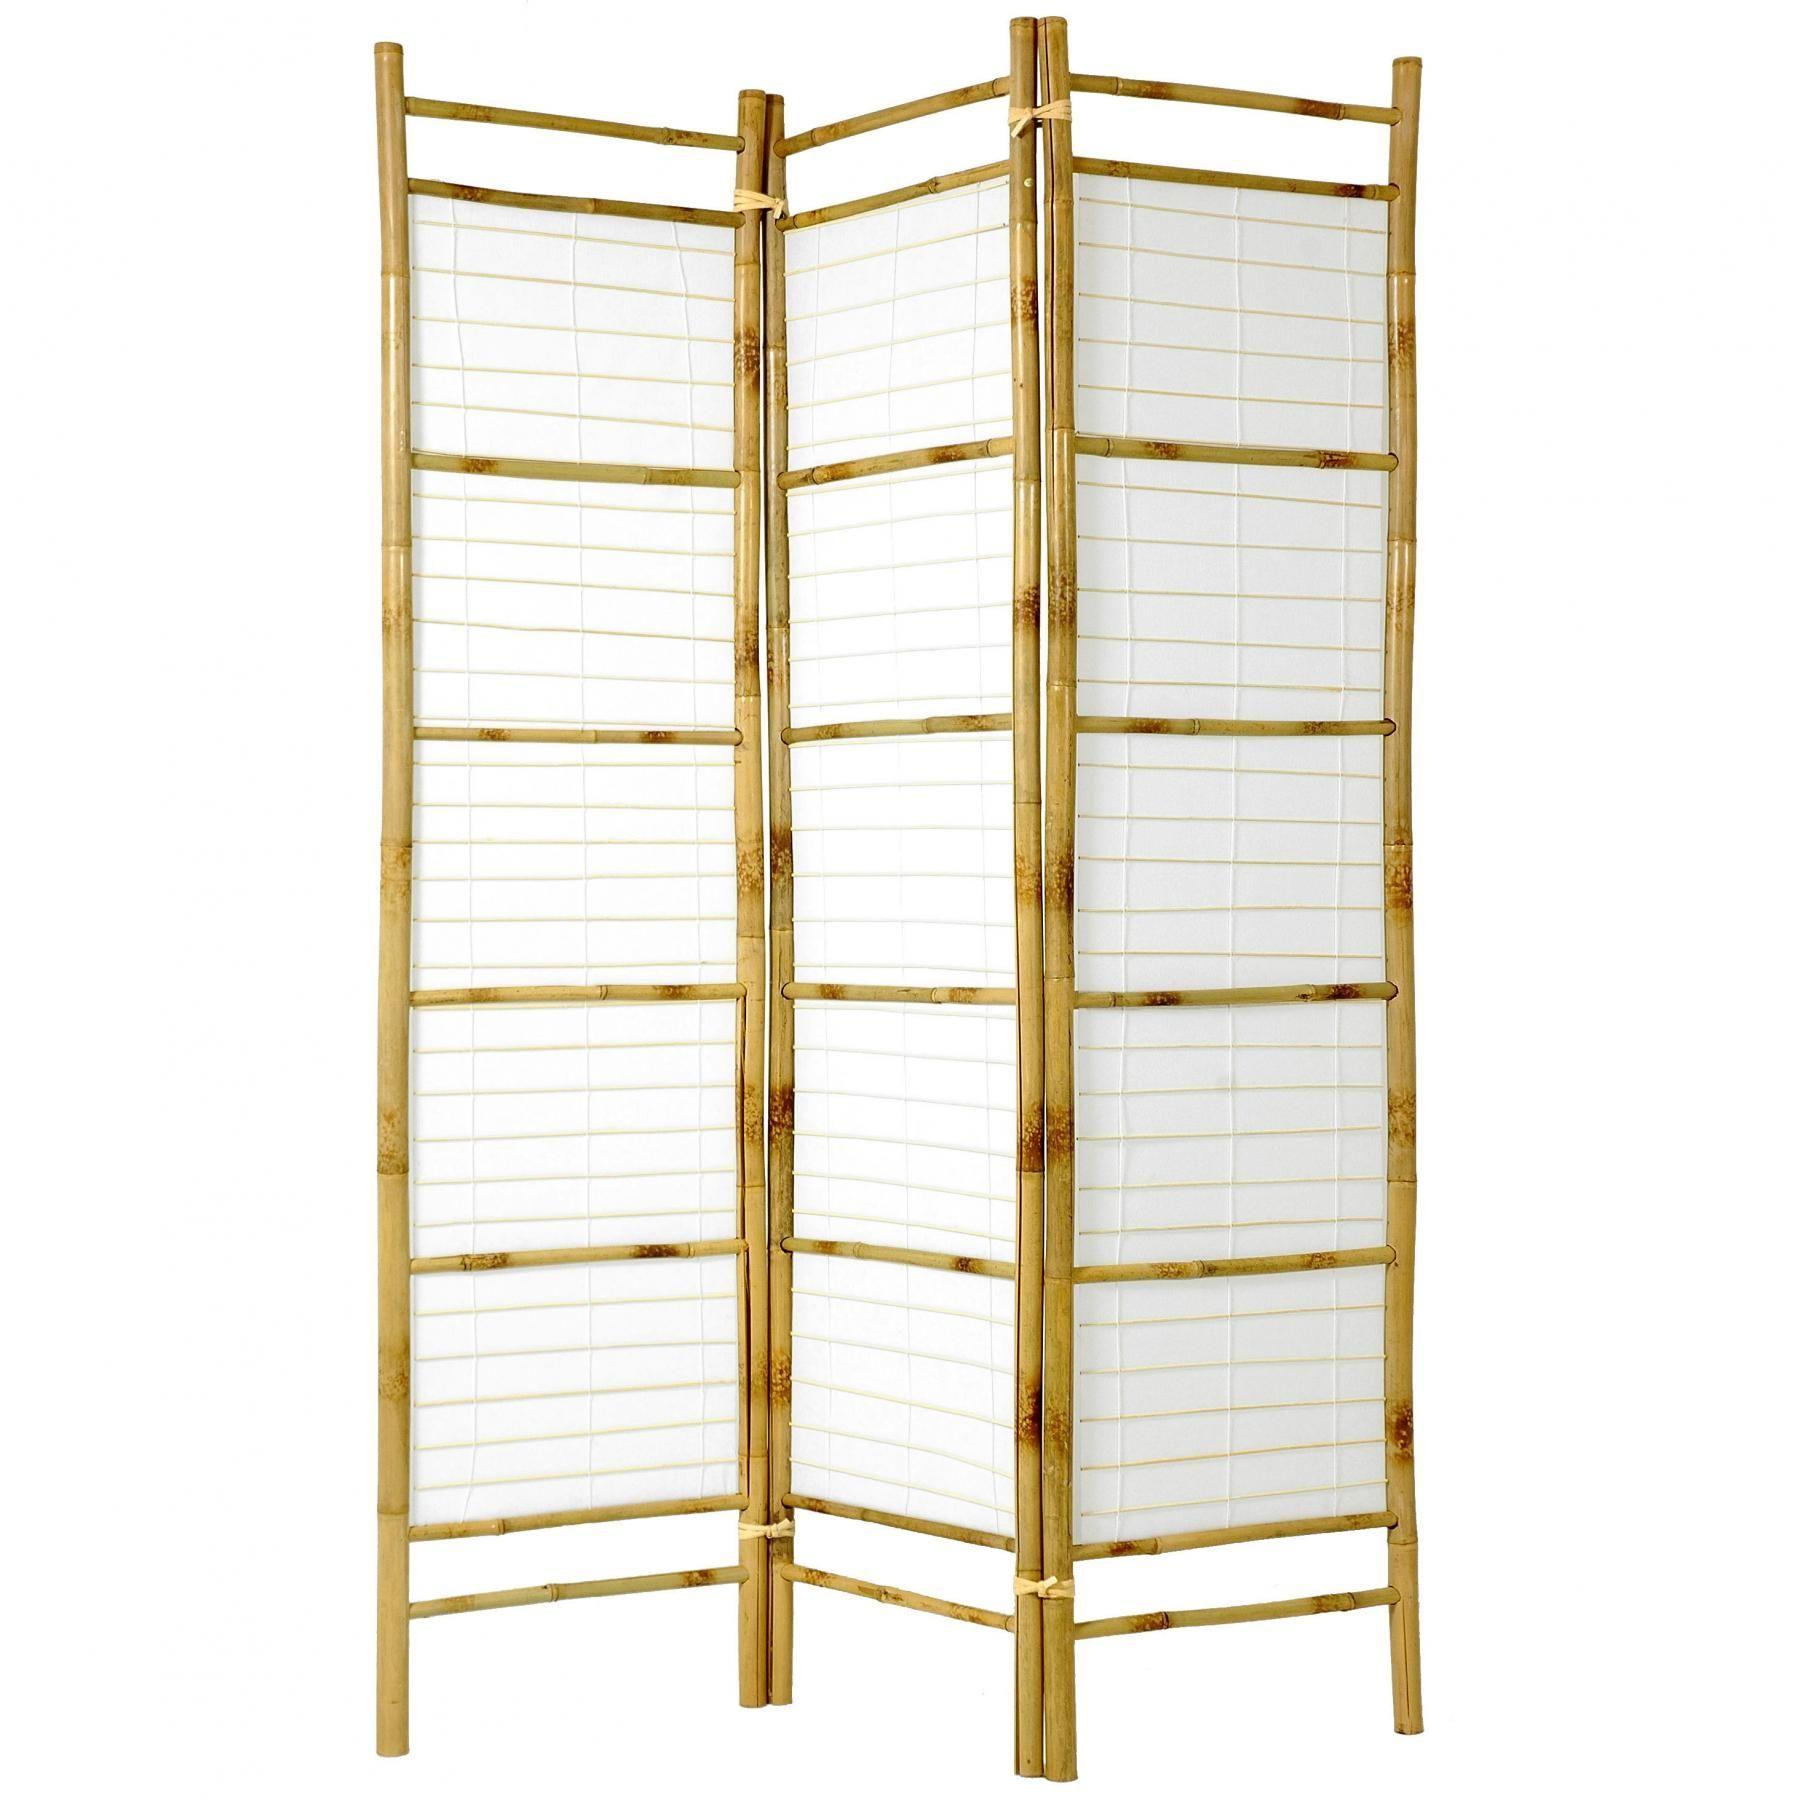 6 Ft Tall Burnt Bamboo With Rice Paper Shoji Screen Roomdividers Com Roomdividerideaslights Bamboo Room Divider Room Divider Shoji Room Divider